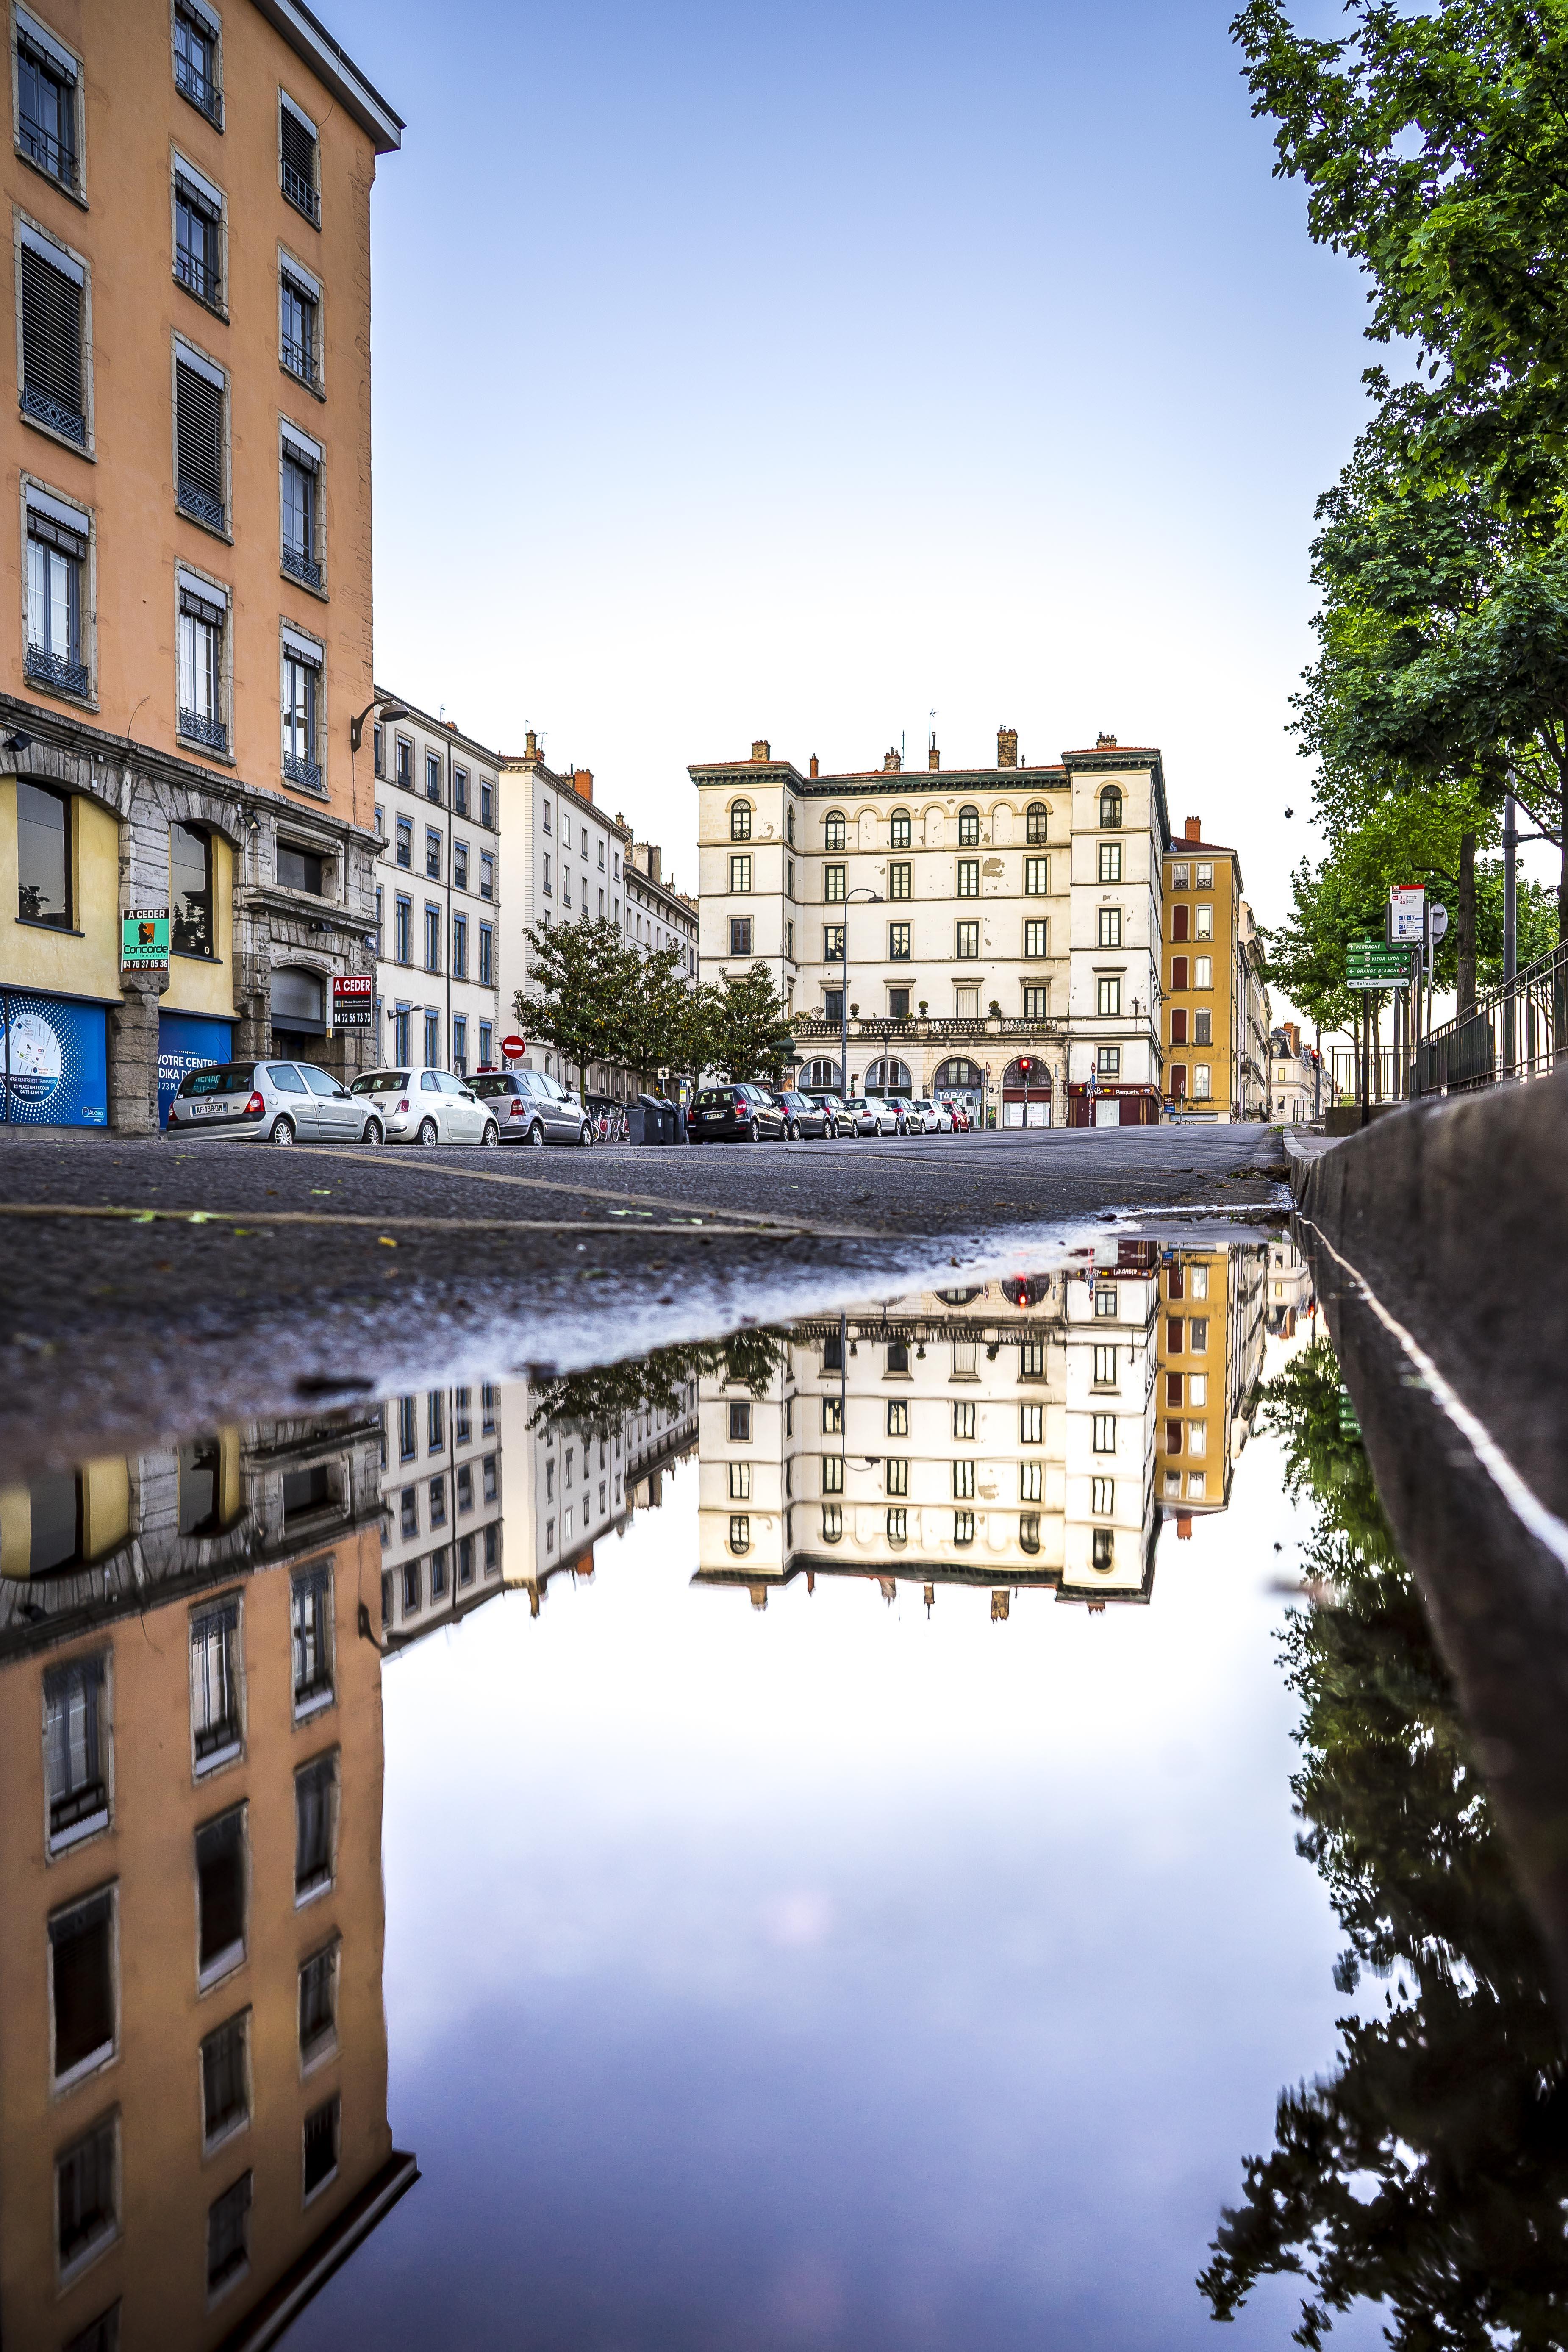 Lyon, France - Quai Tilsit